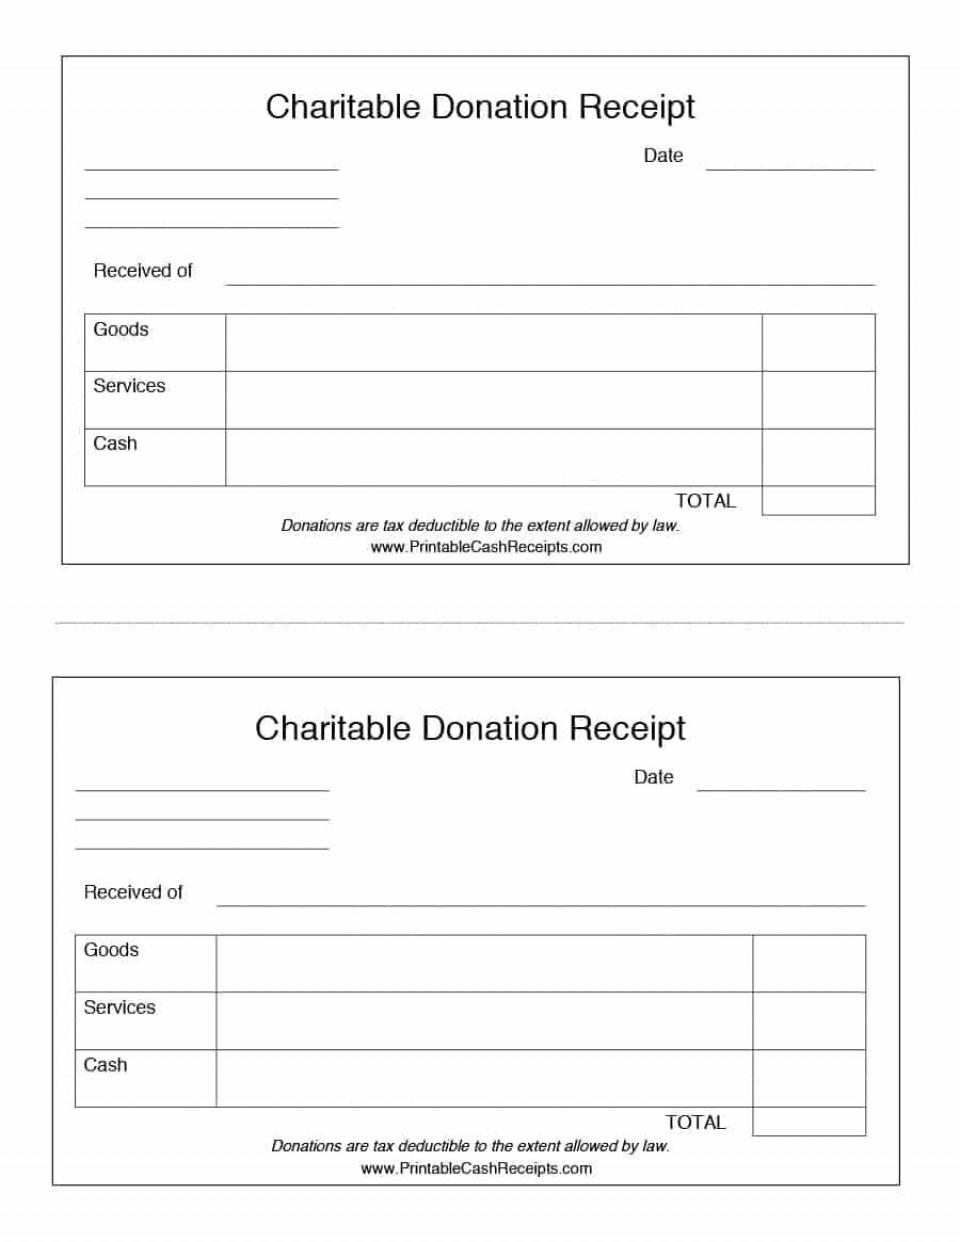 000 Shocking Tax Deductible Donation Receipt Template Australia Sample 960